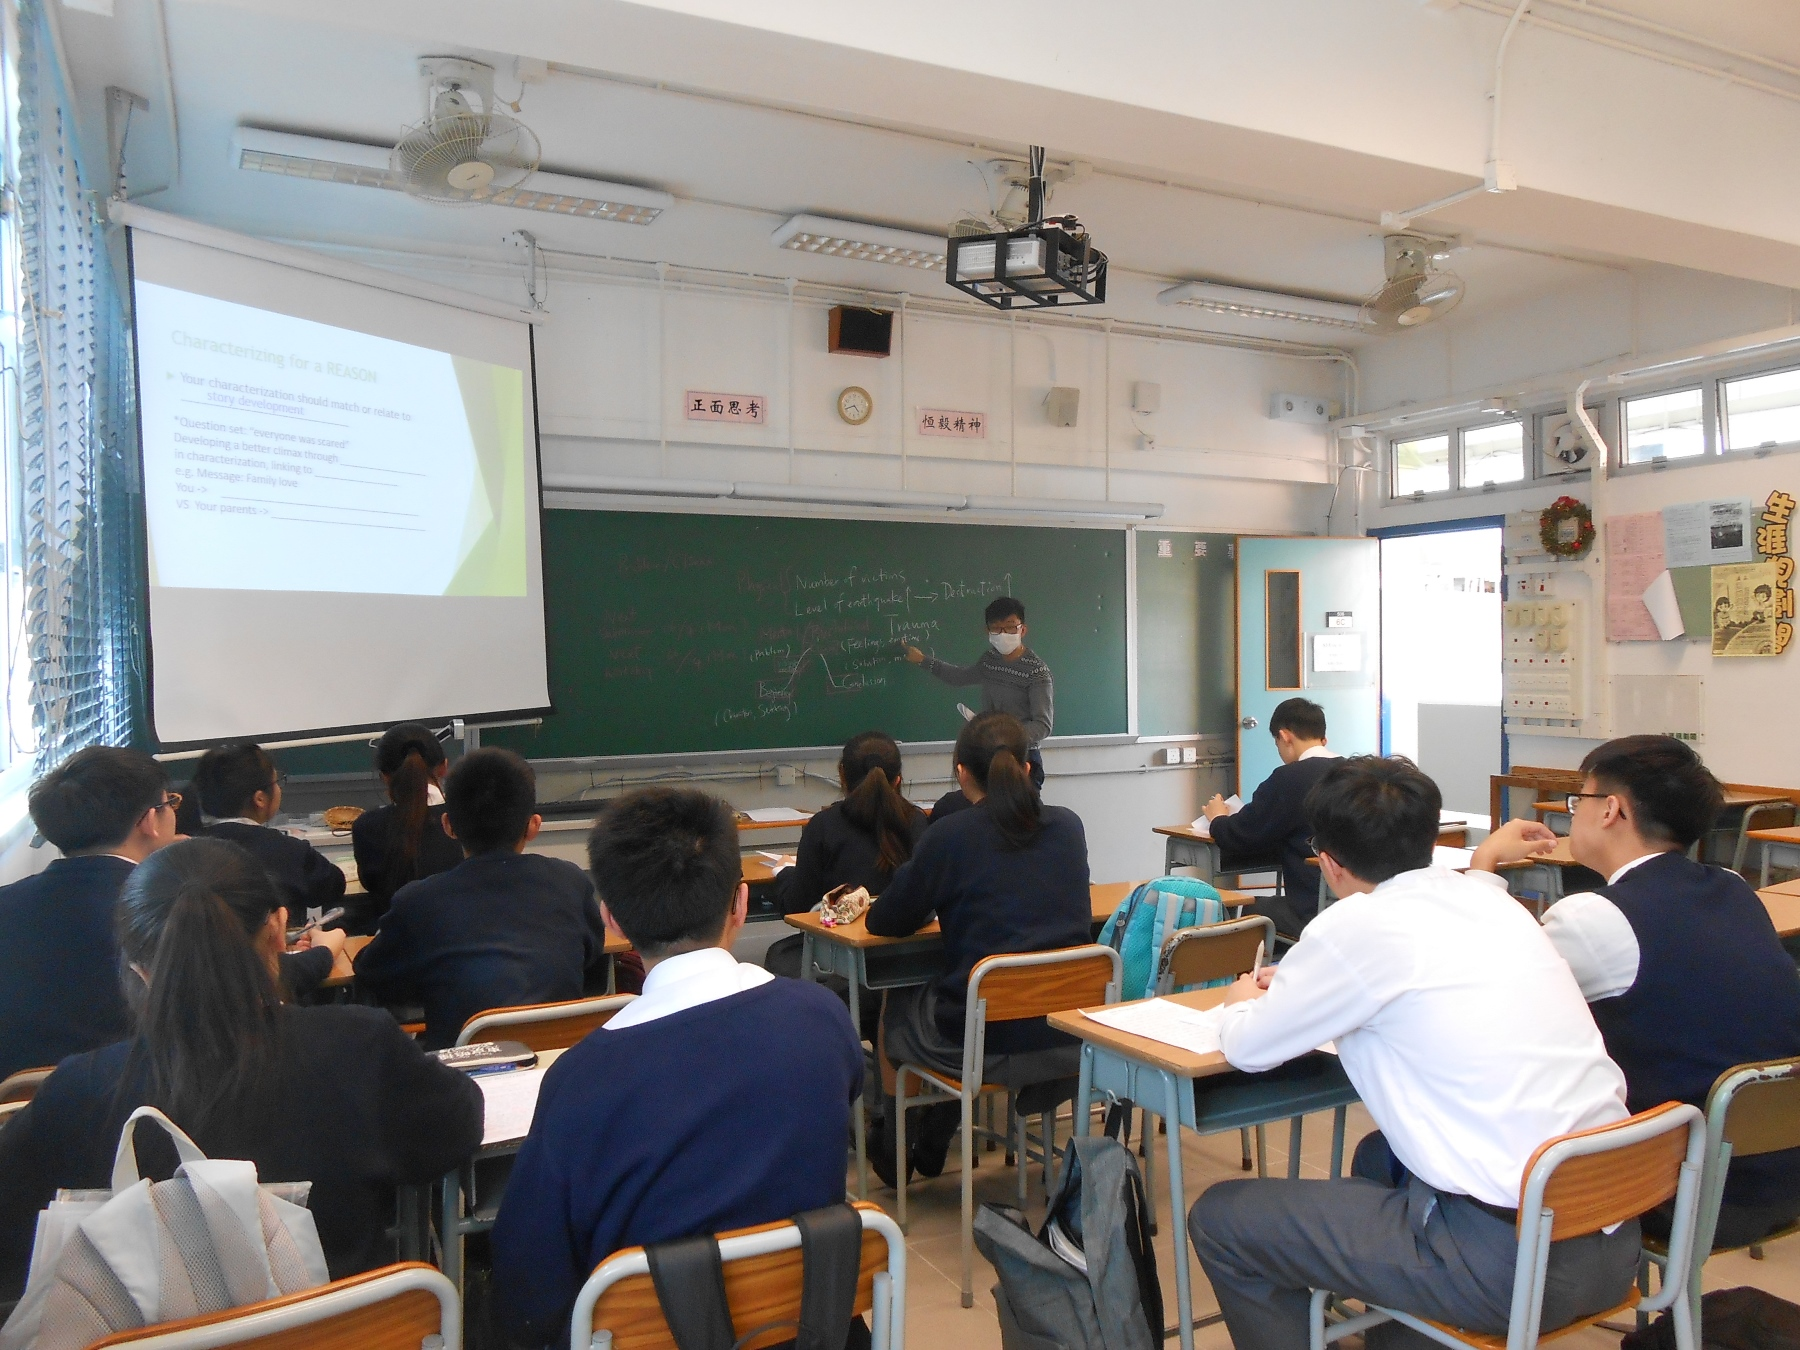 http://npc.edu.hk/sites/default/files/dscn9819.jpg